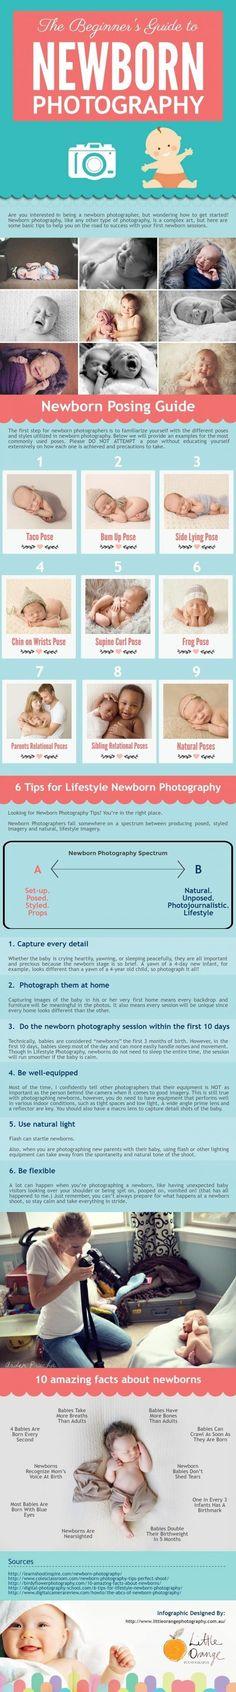 The Beginner's Guide to Newborn Photography. | Austlen Baby Co.